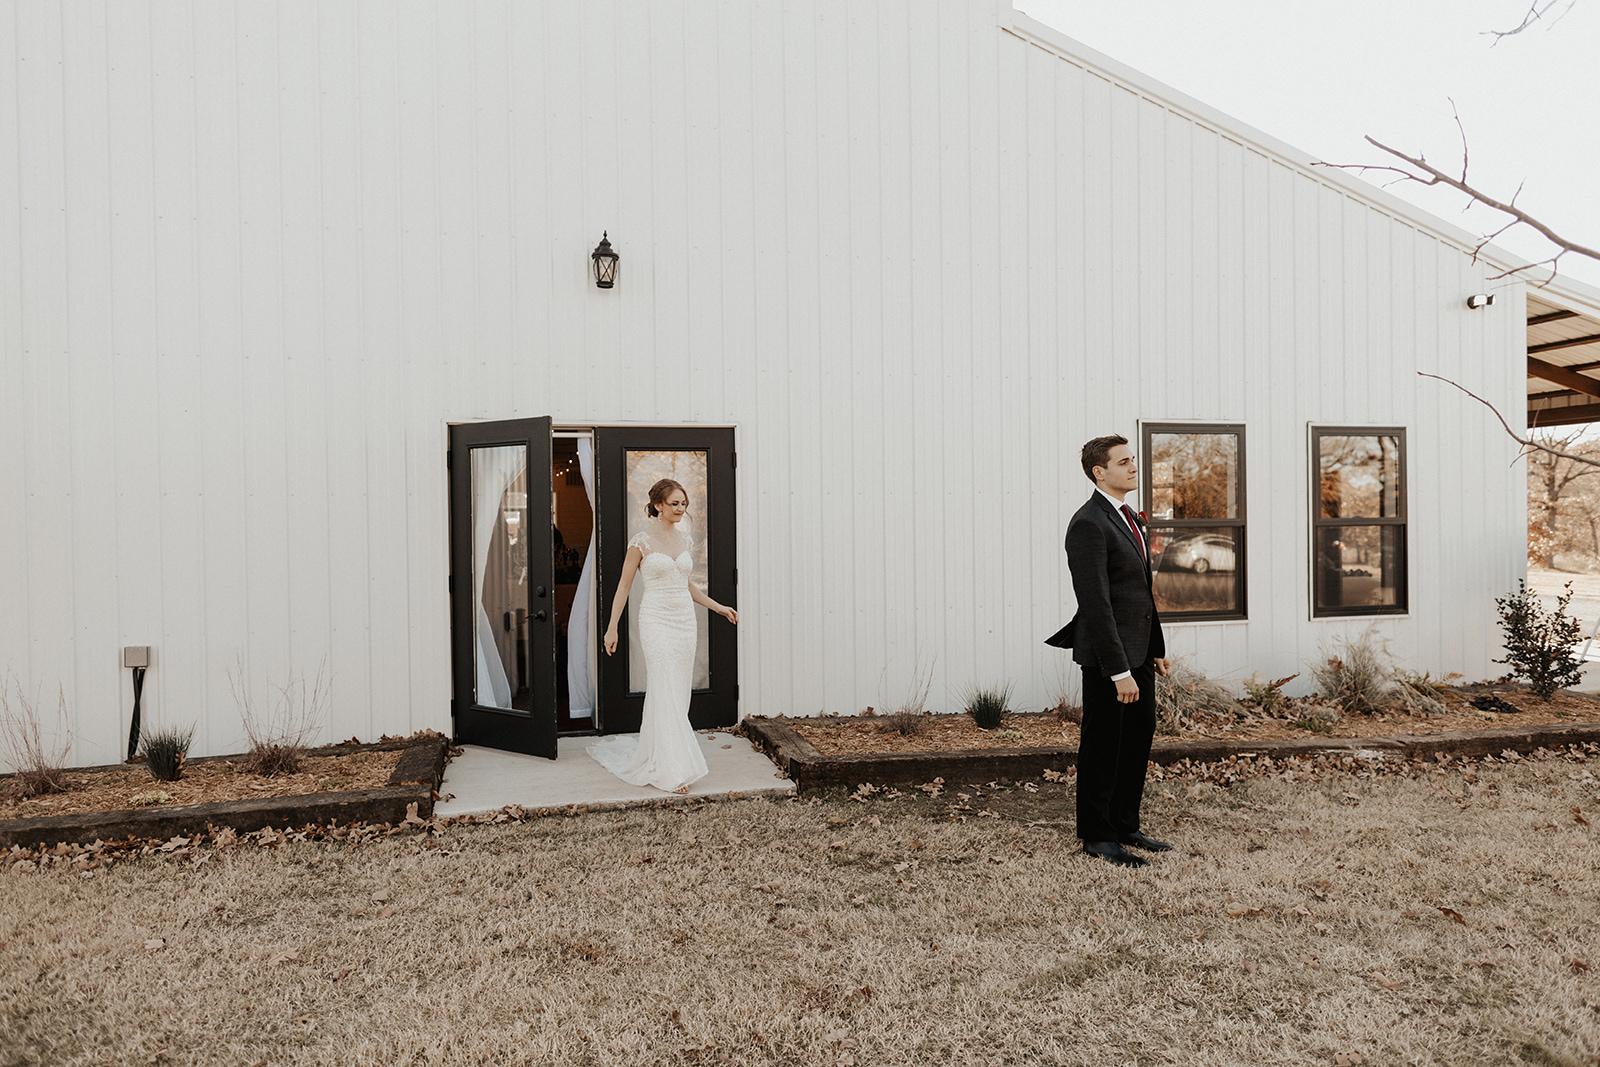 Best Wedding Venue in Tulsa Bixby Dream Point Ranch 13.jpg